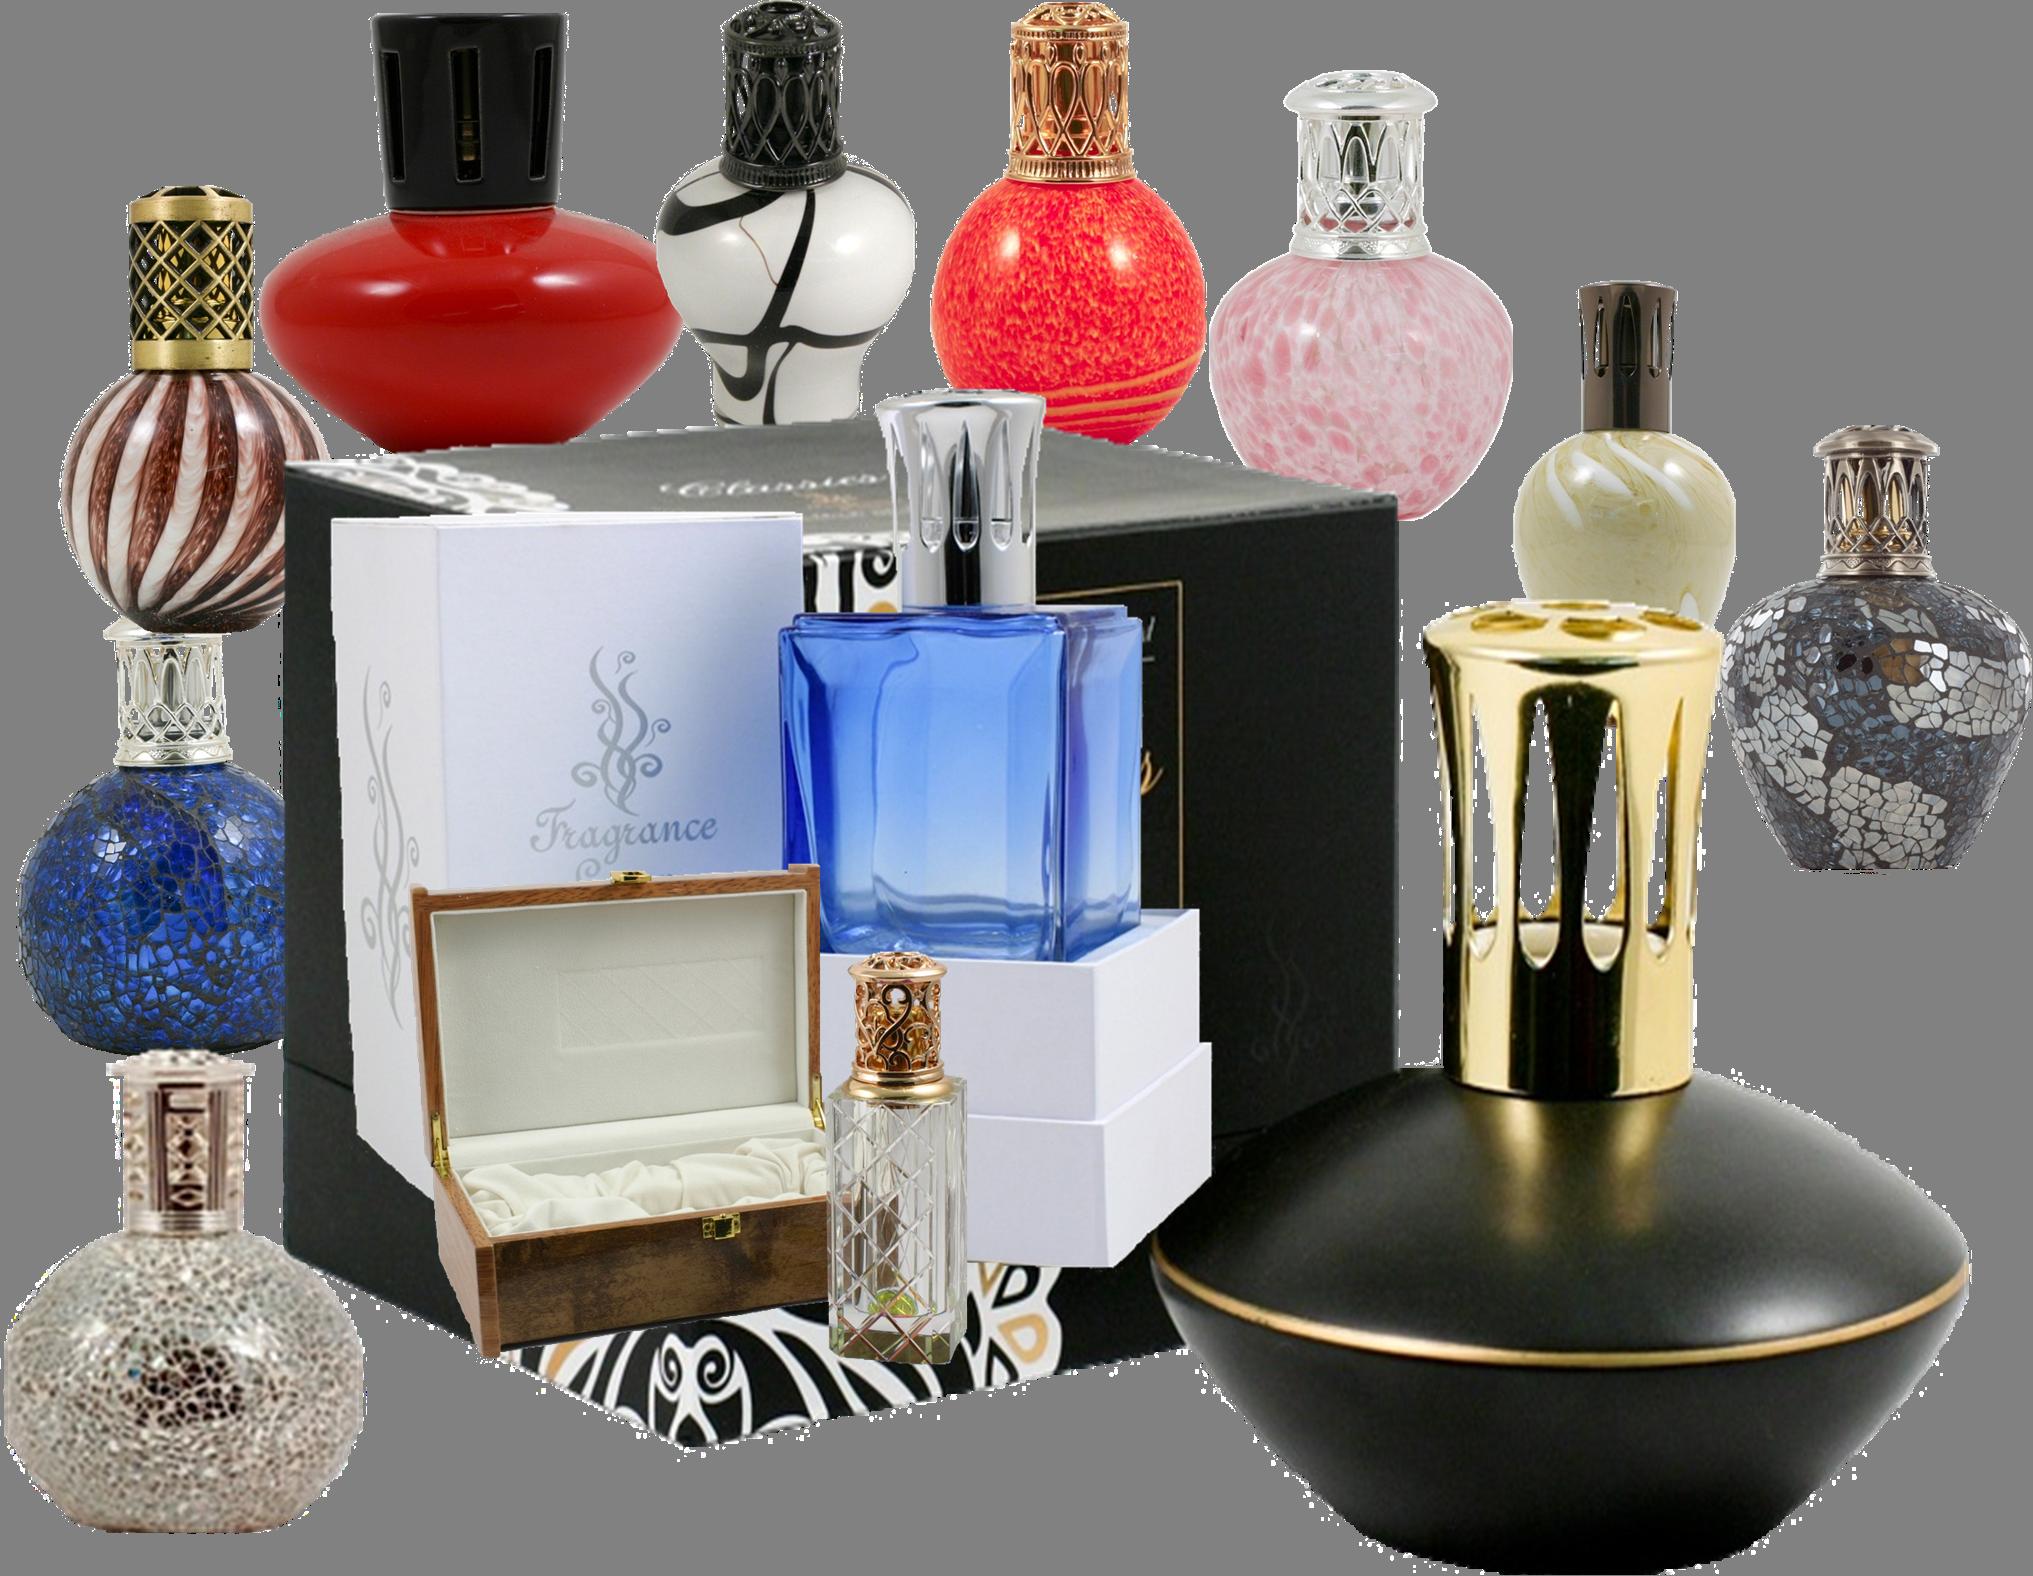 Perfume clipart cologne bottle. Png transparent images all